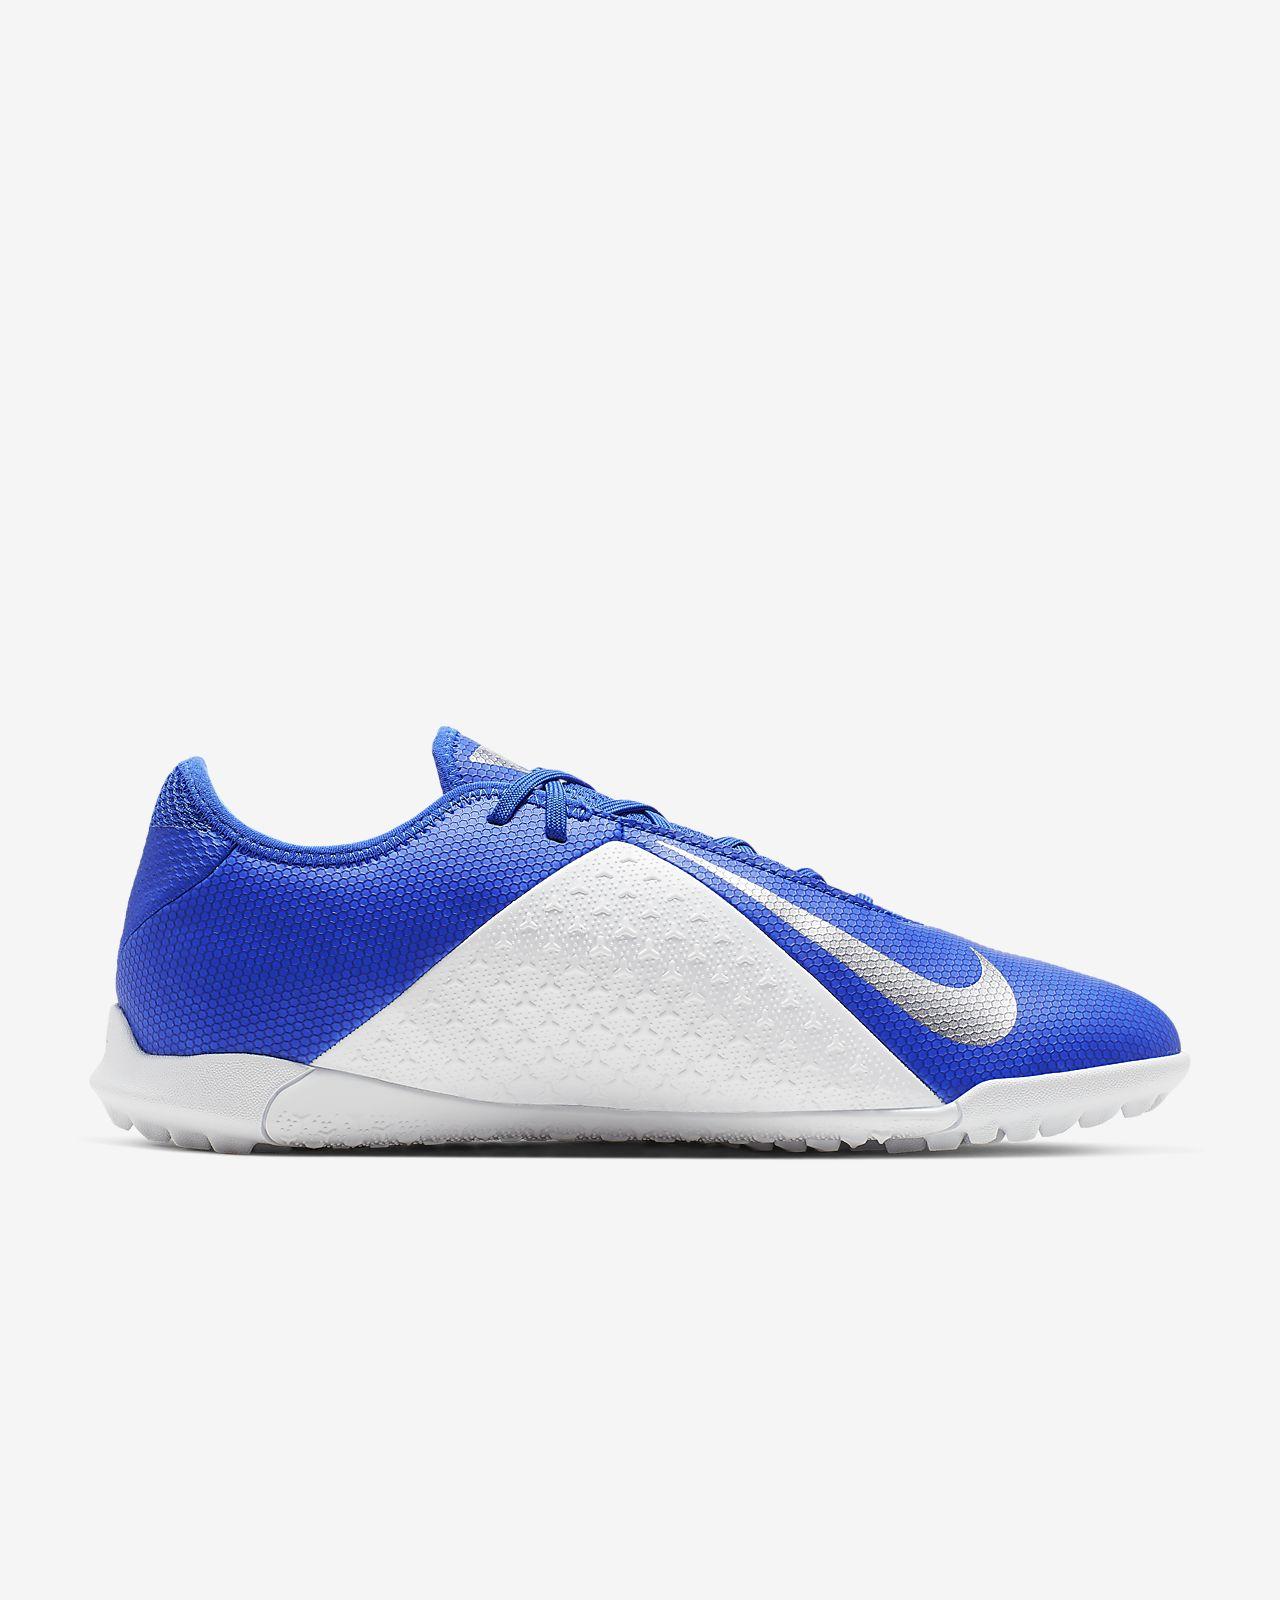 6872019b ... Calzado de fútbol para terreno artificial Nike Phantom Vision Academy